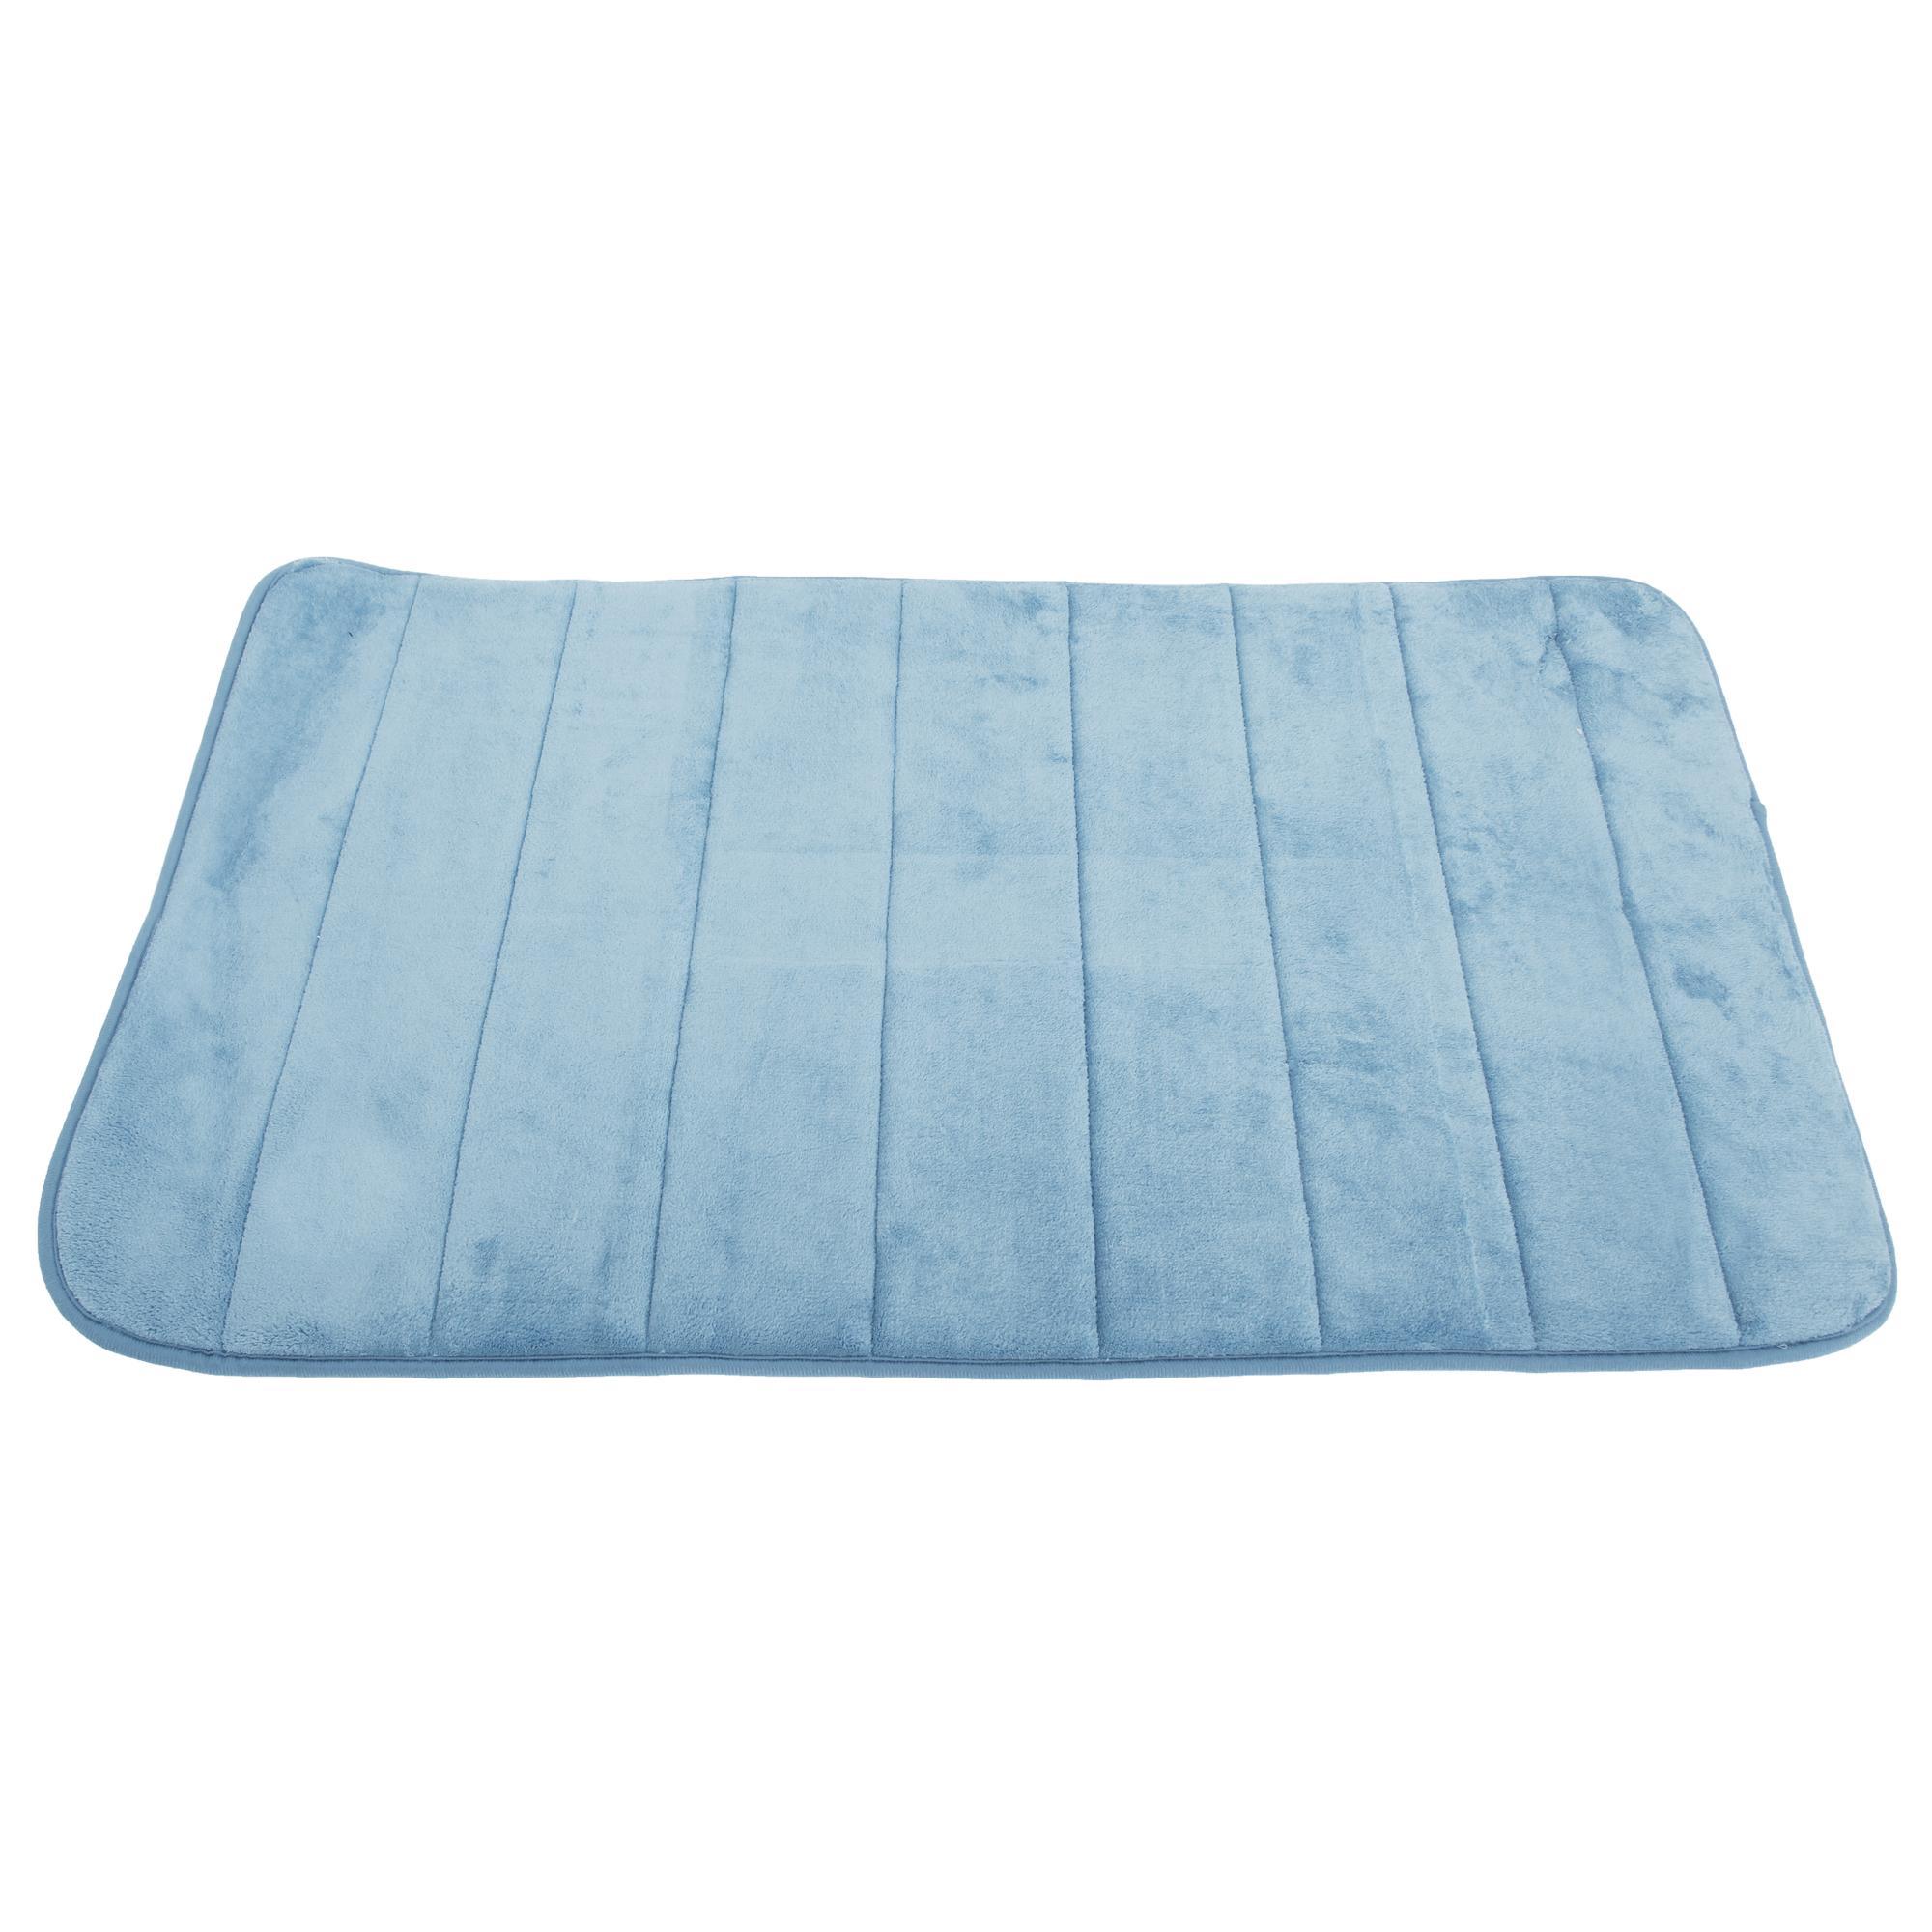 Luxury Non Slip Soft Modern Memory Foam Bathroom /Bath Mat